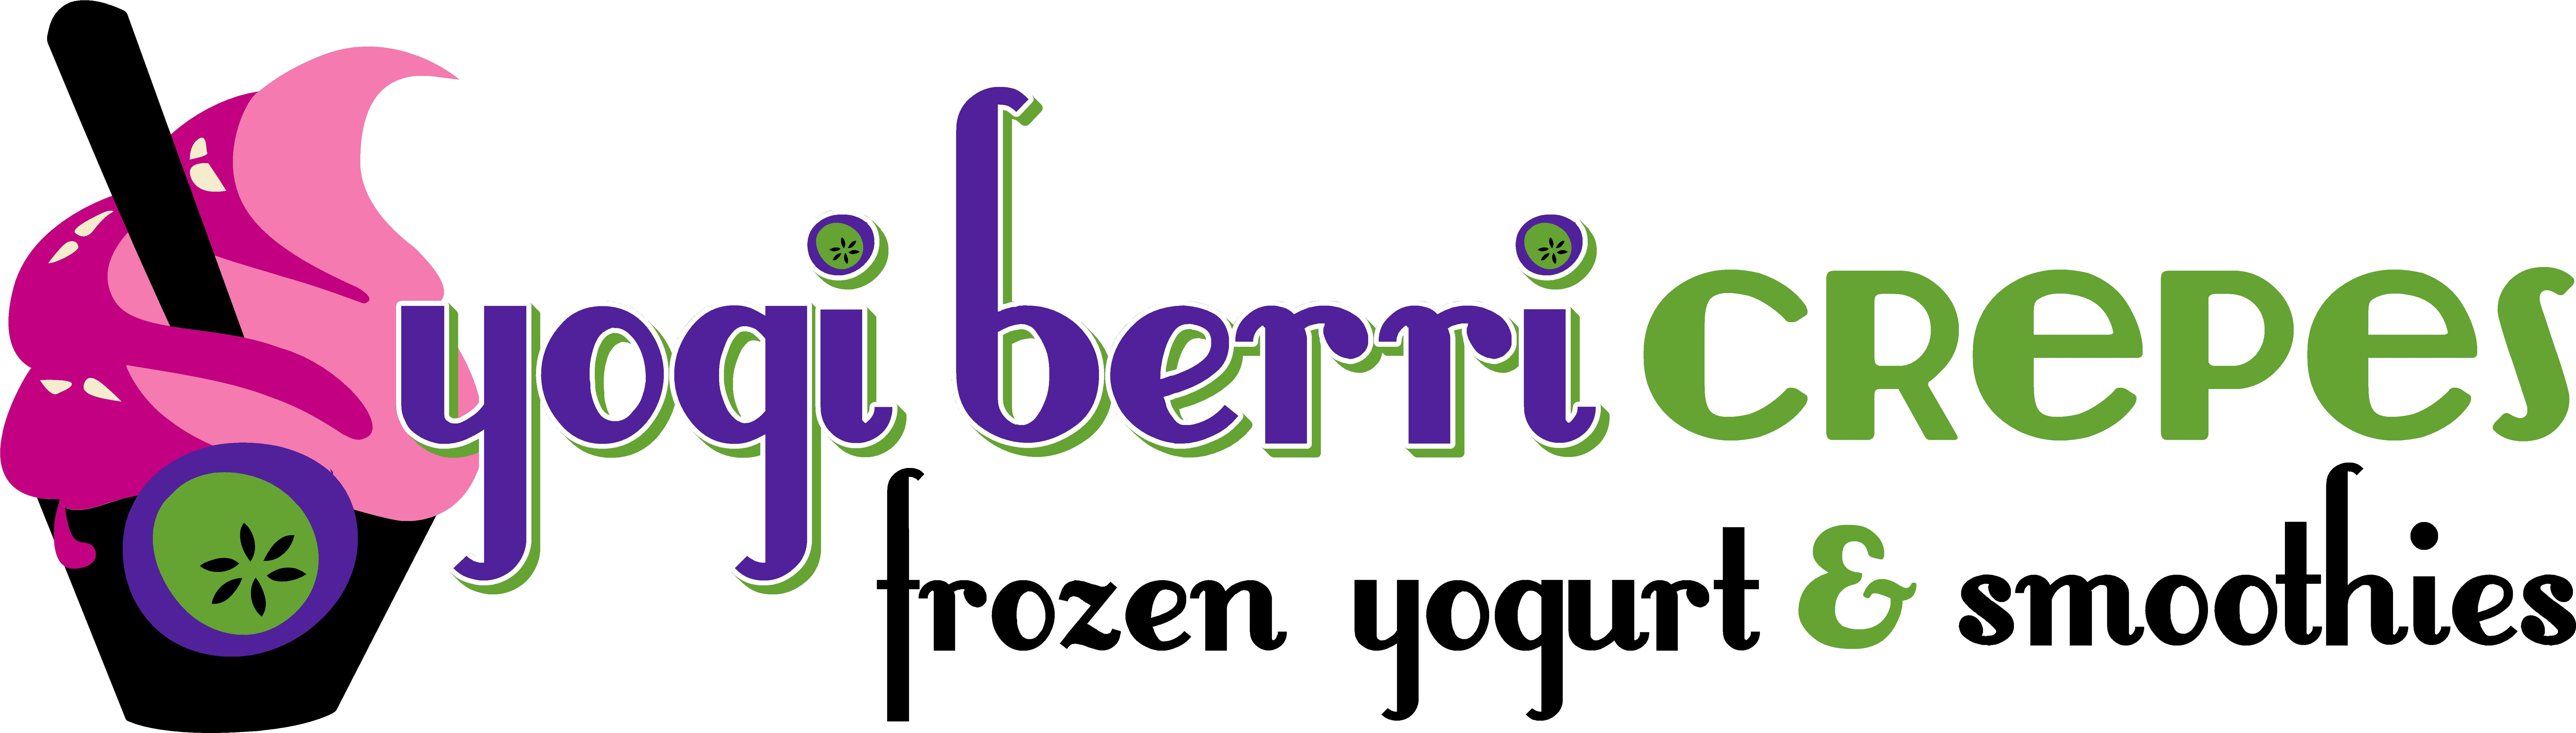 yogi berri logo.JPG